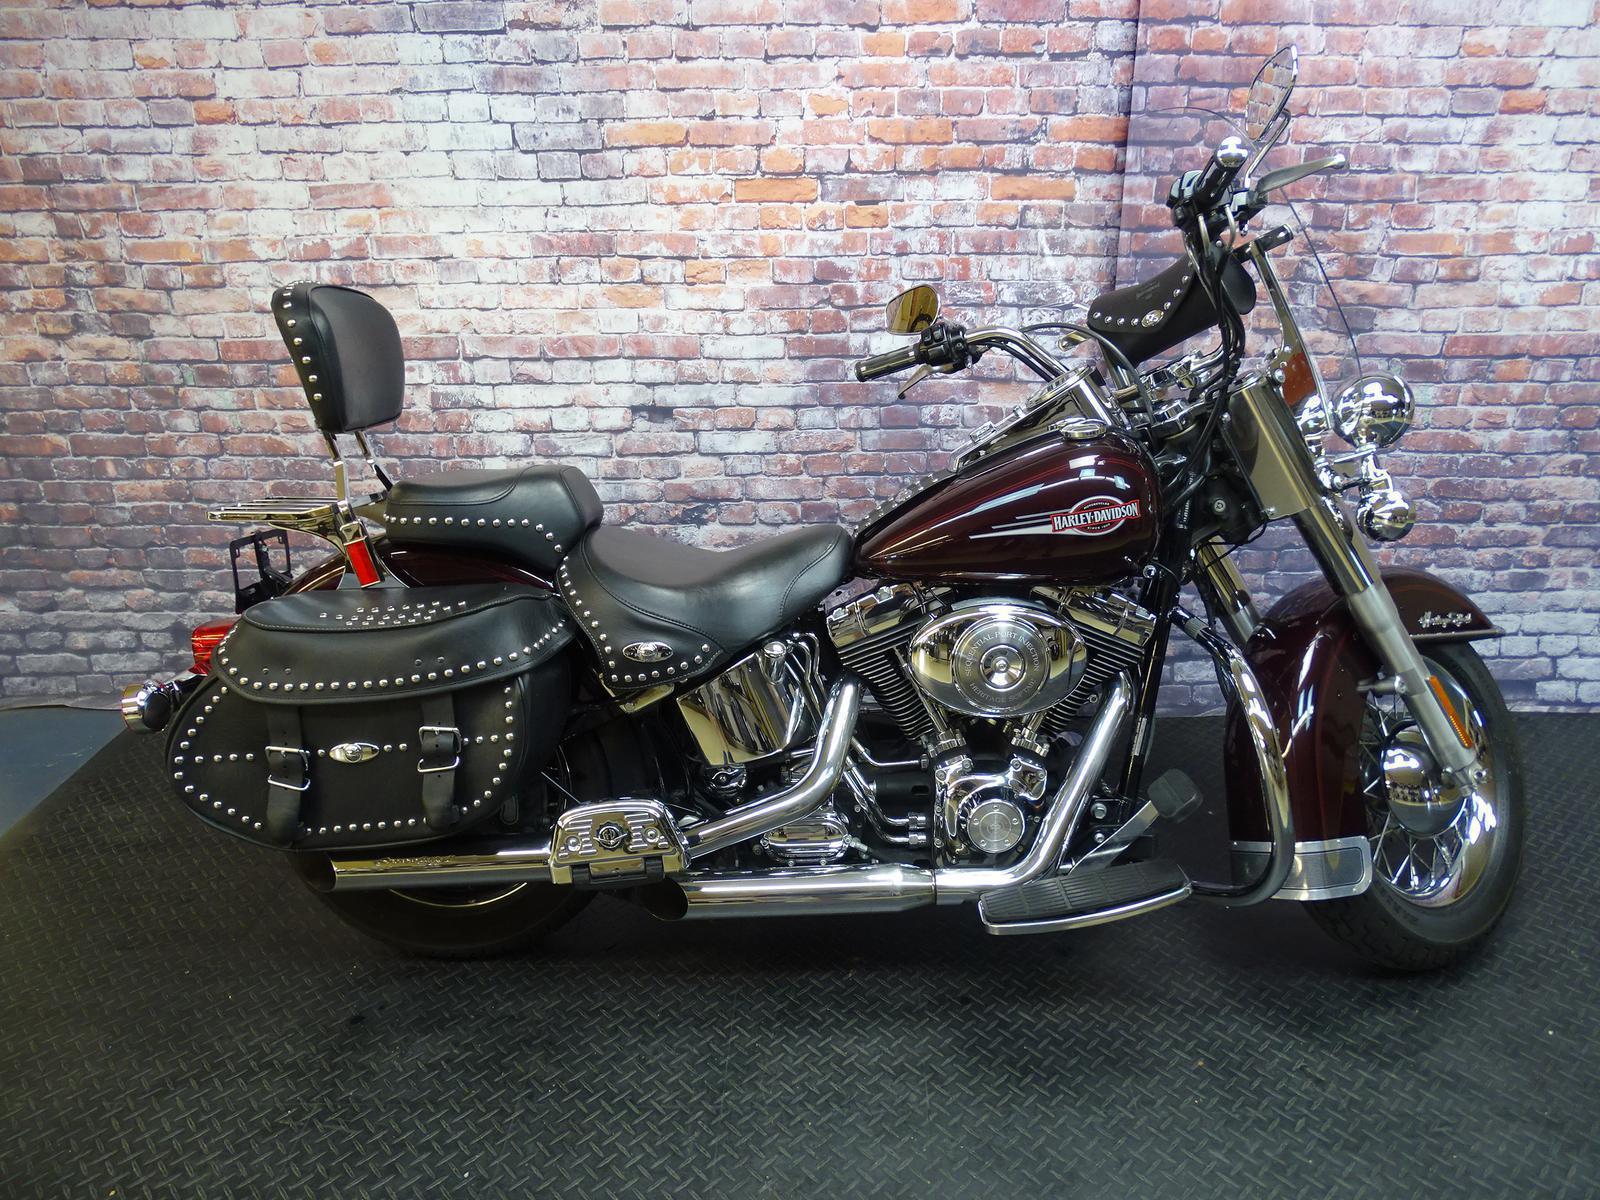 Harbor Town Harley Davidson Heritage Softail Clic 2008 Flstc